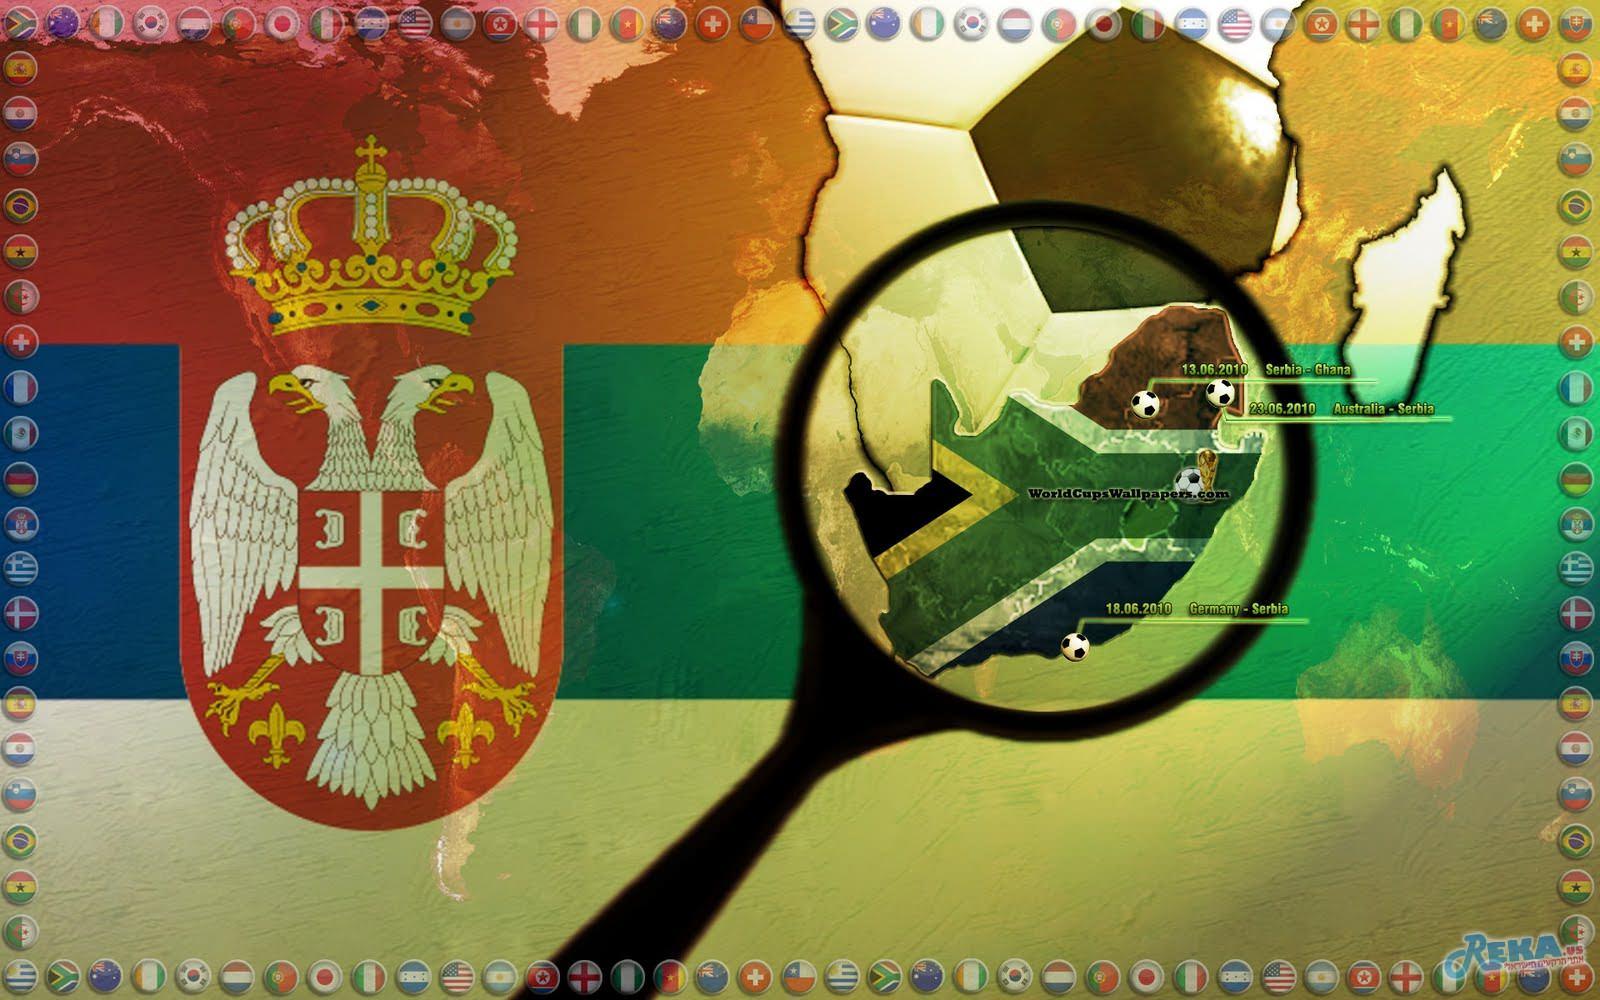 Serbia-World-Cup-2010-Widescreen-Wallpaper